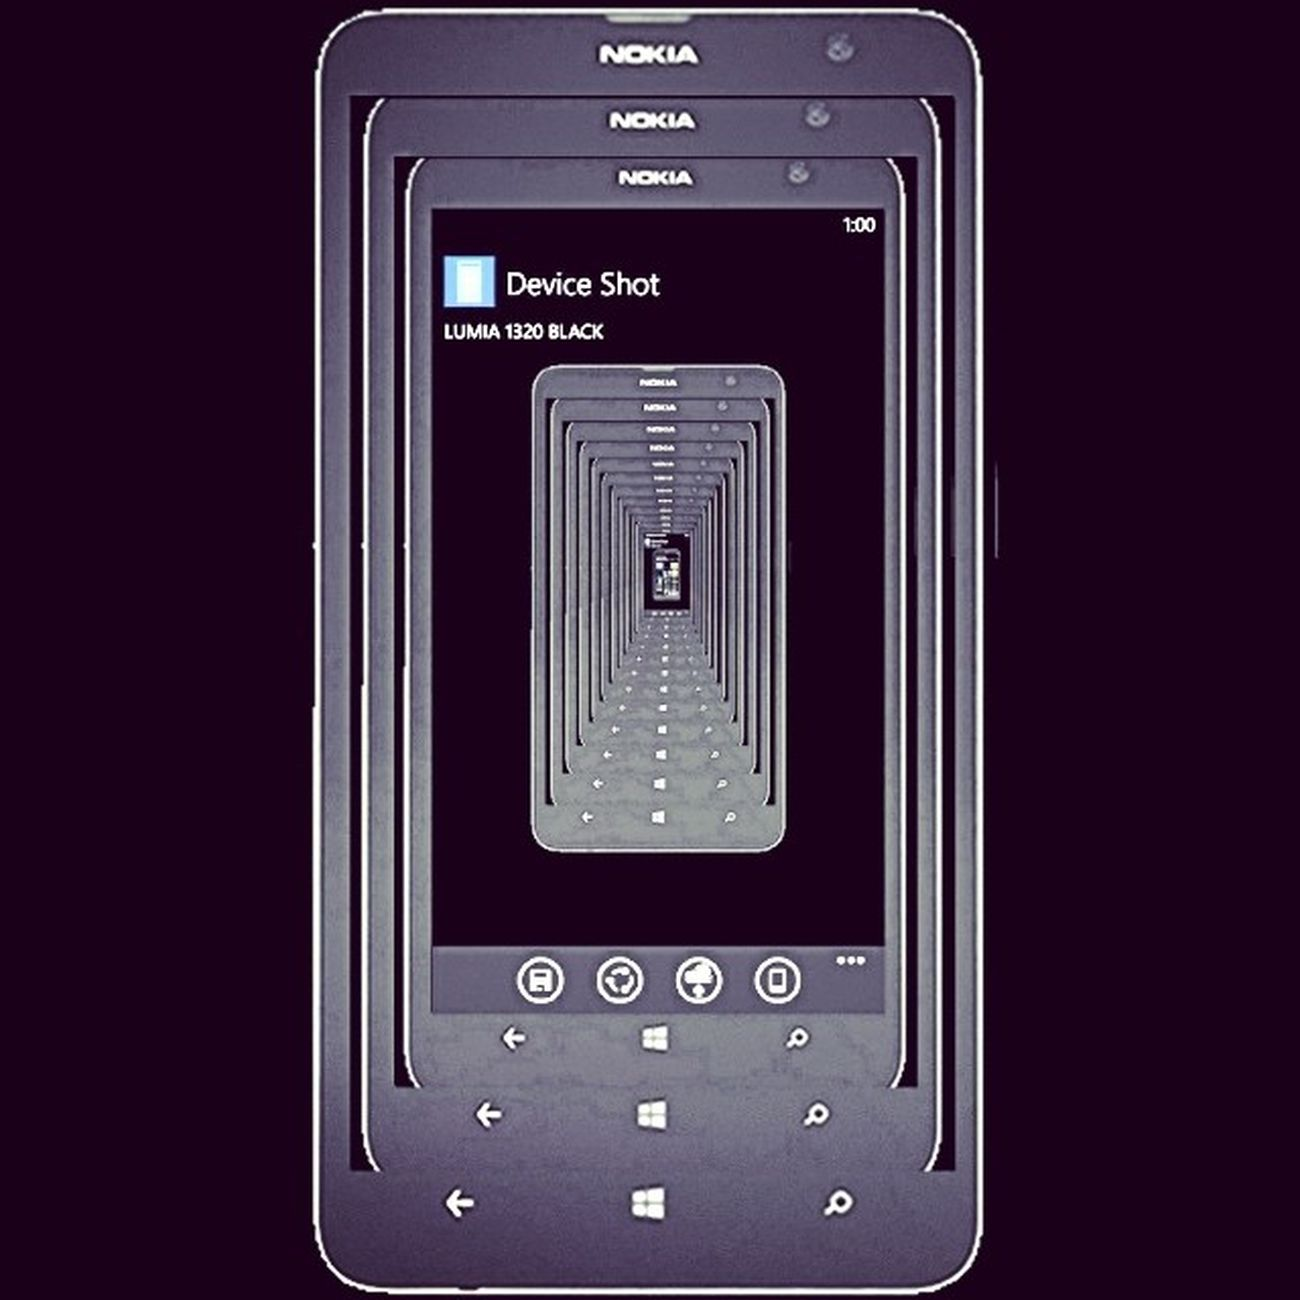 Deviceshot Windowsphone Windowsphone8 Winphan wpphoto lumia1320